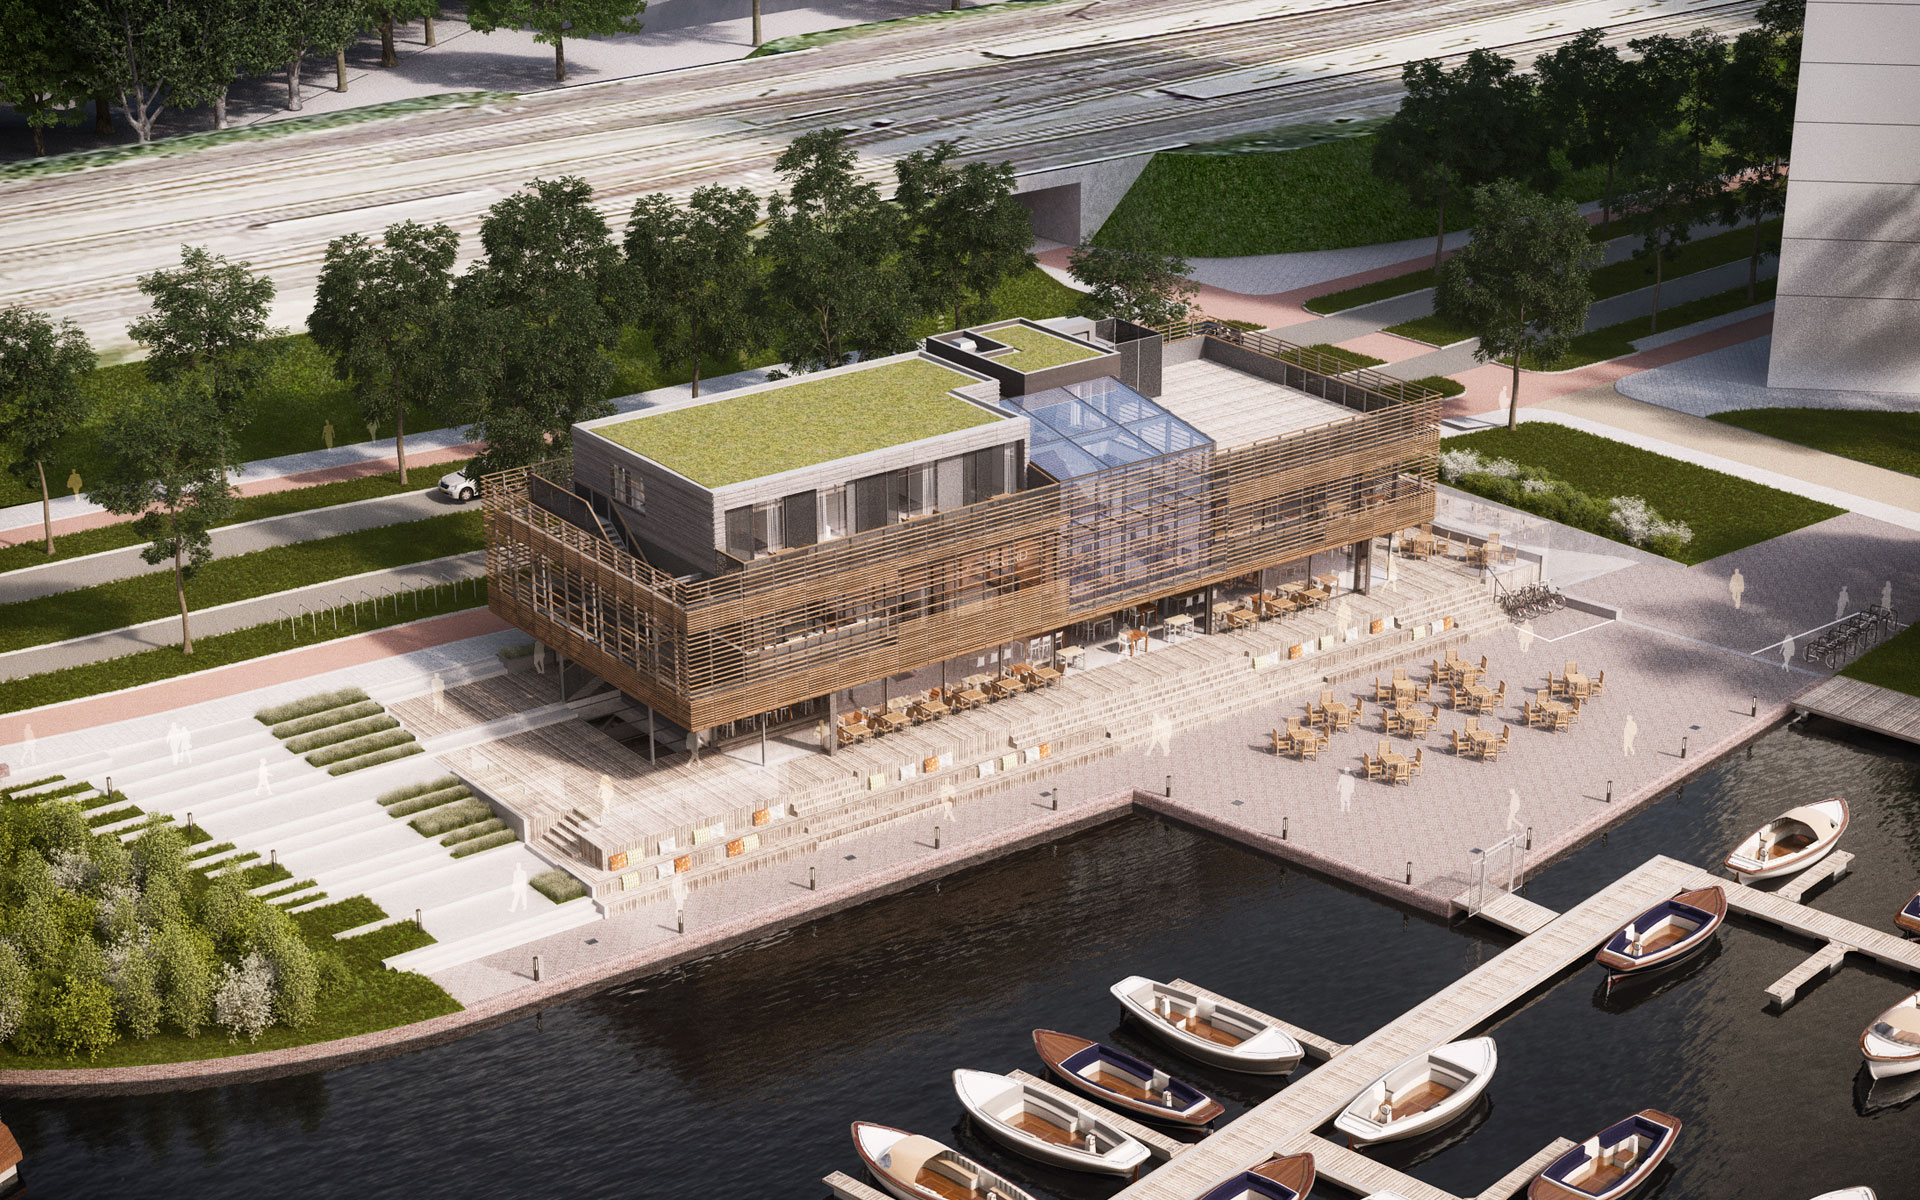 Coming soon: George Marina Amsterdam - GreaterVenues.com George Marina Amsterdam